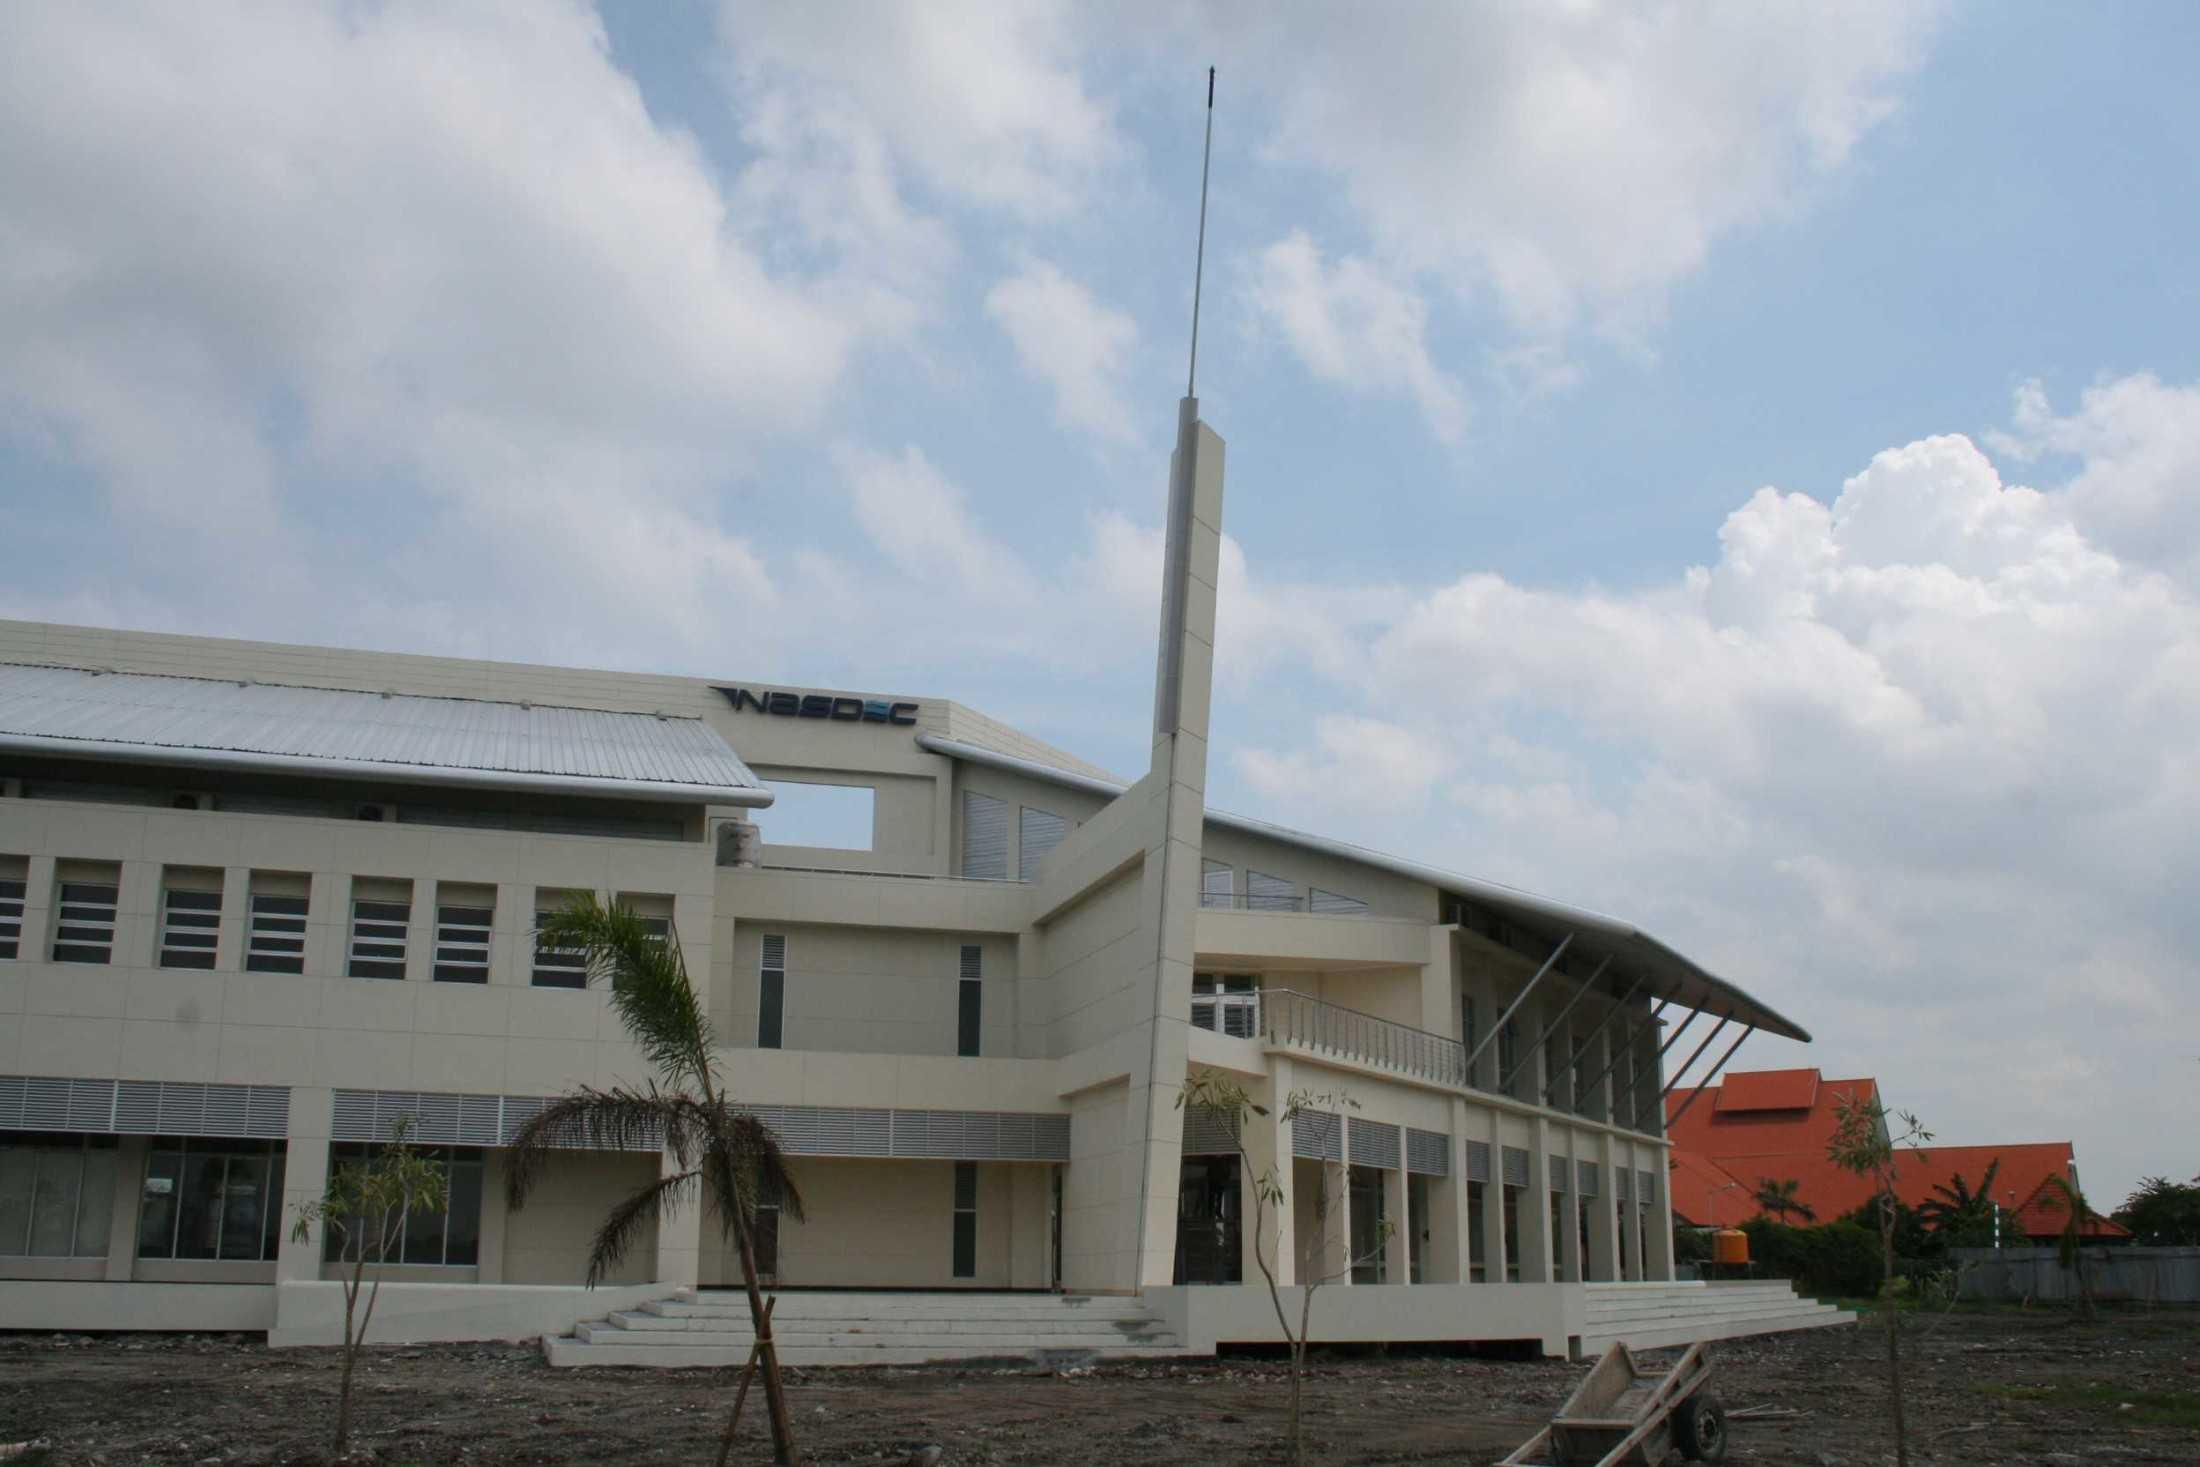 Ega Cipta Pratama Desain Gedung Nasdec Its Surabaya, Kota Sby, Jawa Timur, Indonesia Surabaya, Kota Sby, Jawa Timur, Indonesia Ega-Cipta-Pratama-Desain-Gedung-Nasdec-Its Minimalis 55483